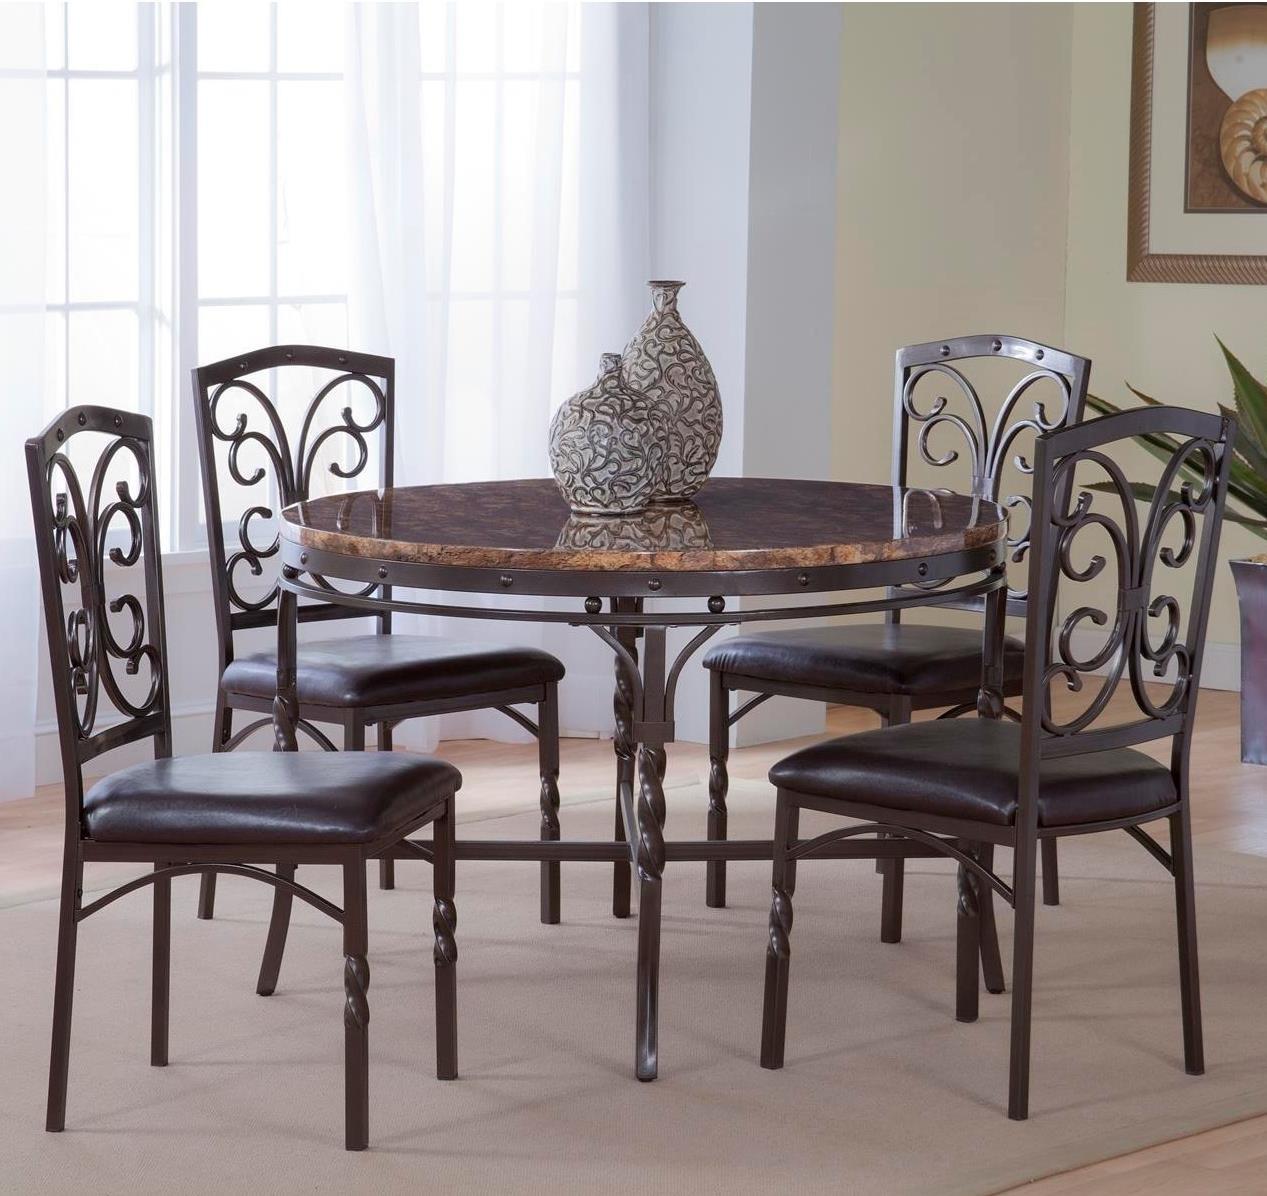 Bernards Tuscan 5-Piece Metal/Faux Marble Dinette Table Set  sc 1 st  Royal Furniture & Bernards Tuscan 5-Piece Metal/Faux Marble Dinette Table Set | Royal ...